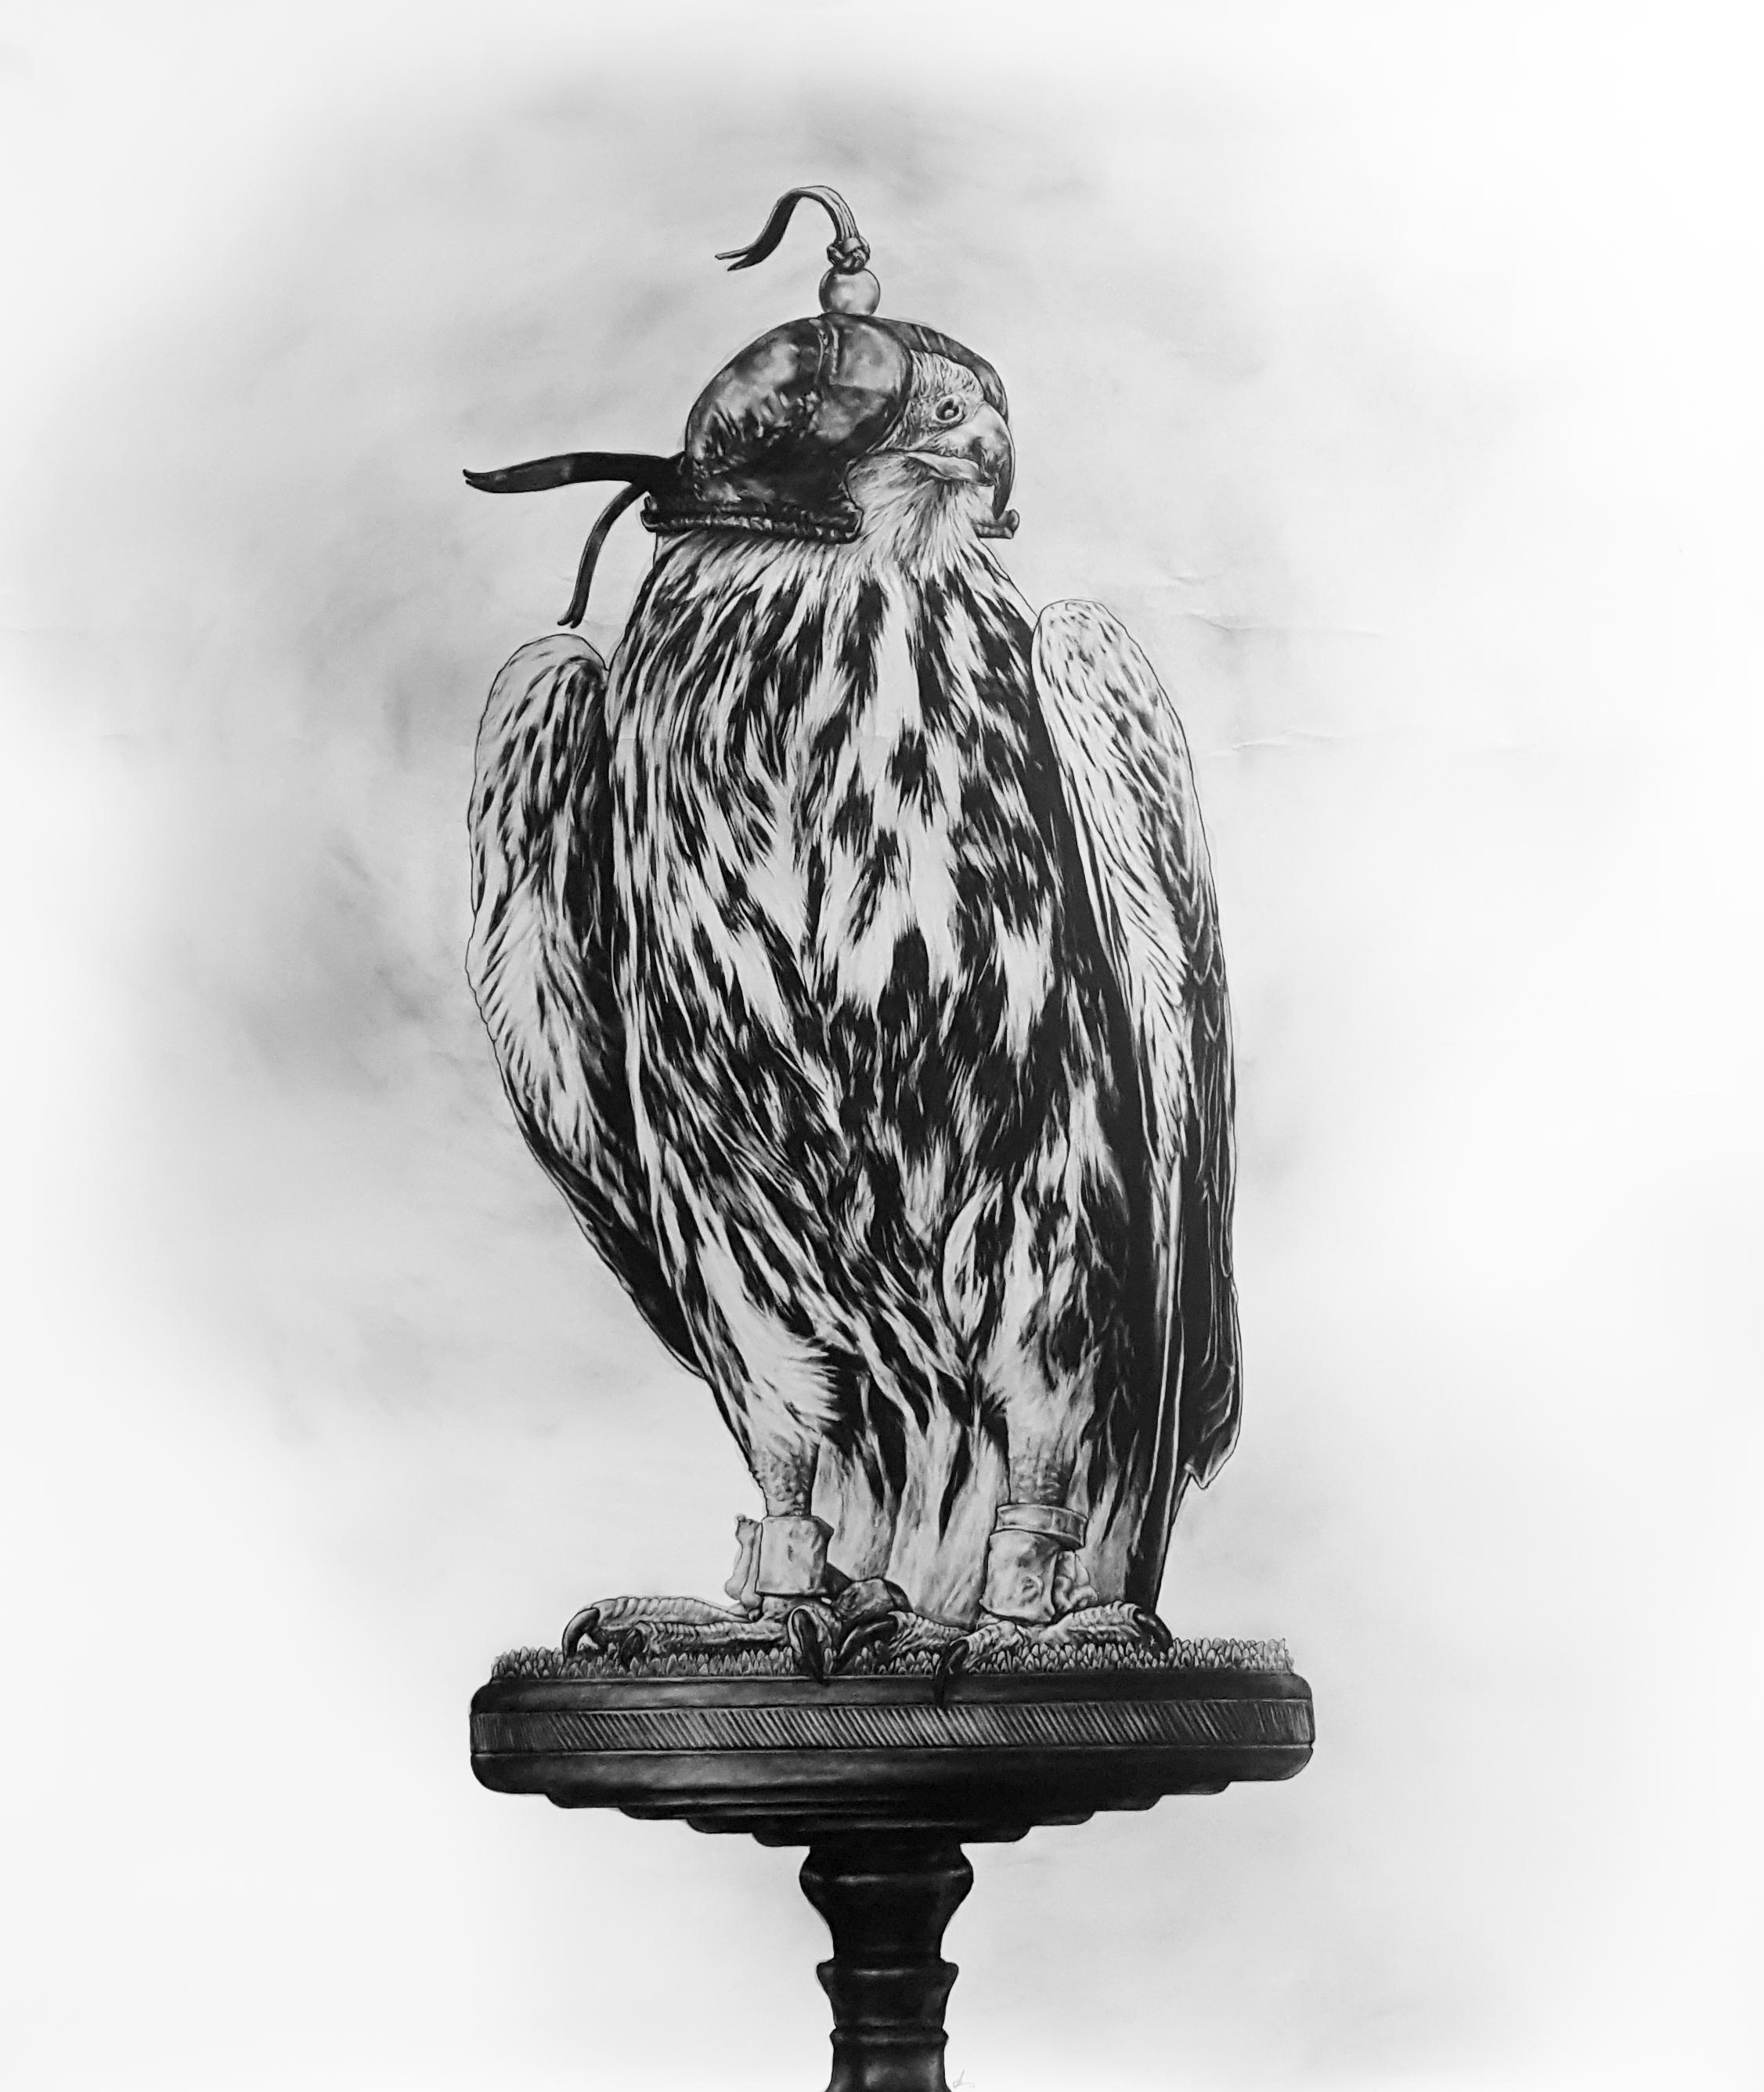 Hooded Falcon. 2017-18. Graphite on 300GSM Fabriano Artistico Paper (140 x 120cm) SOLD